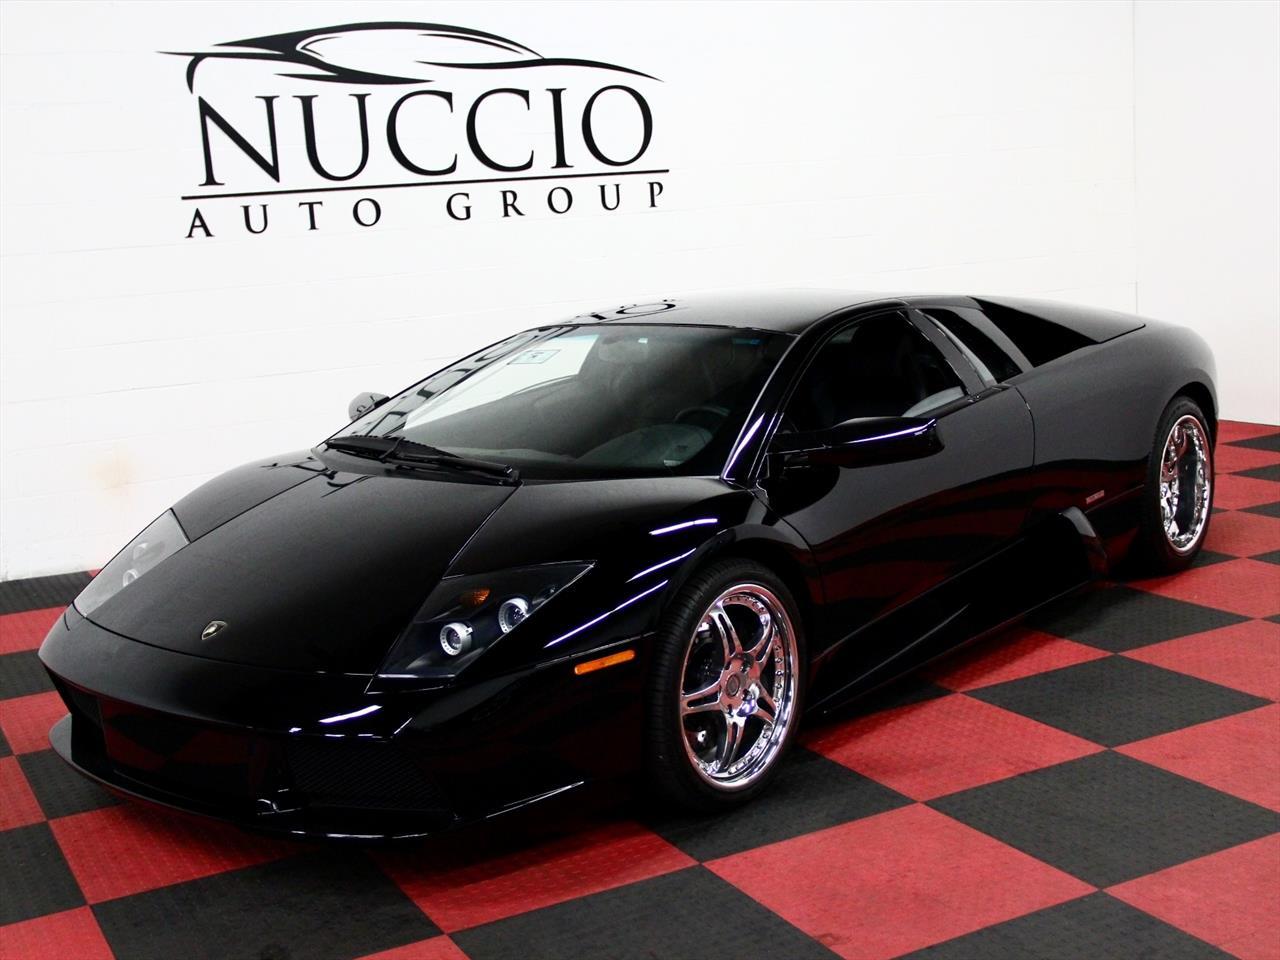 2004 Lamborghini Murcielago Coupe